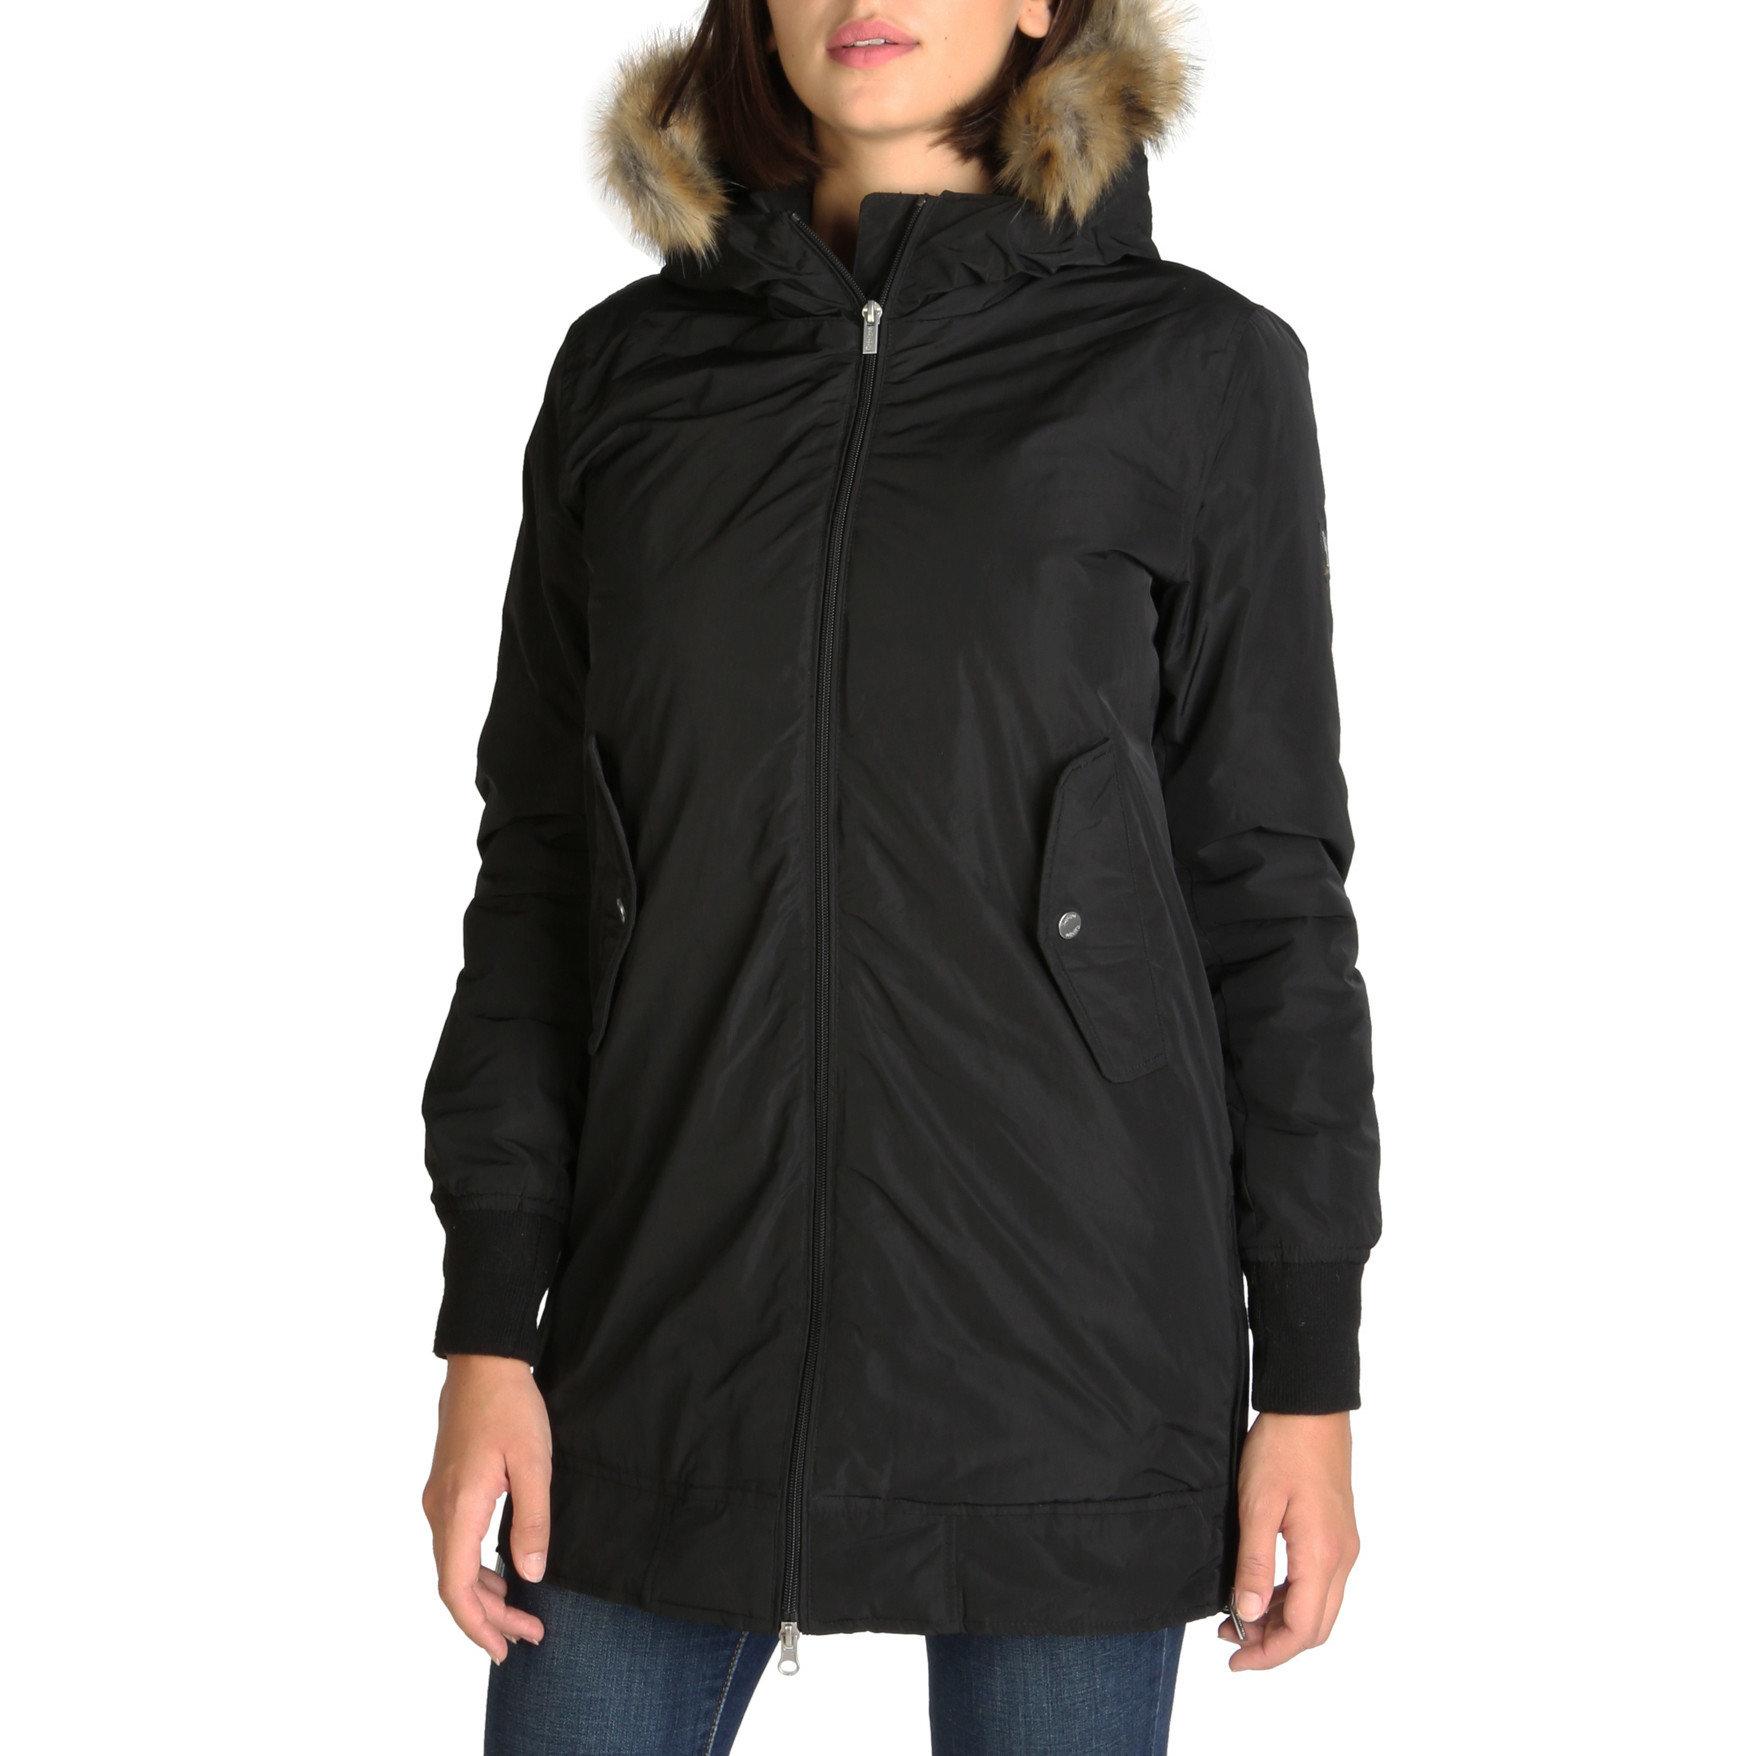 long jacket with a furry hood